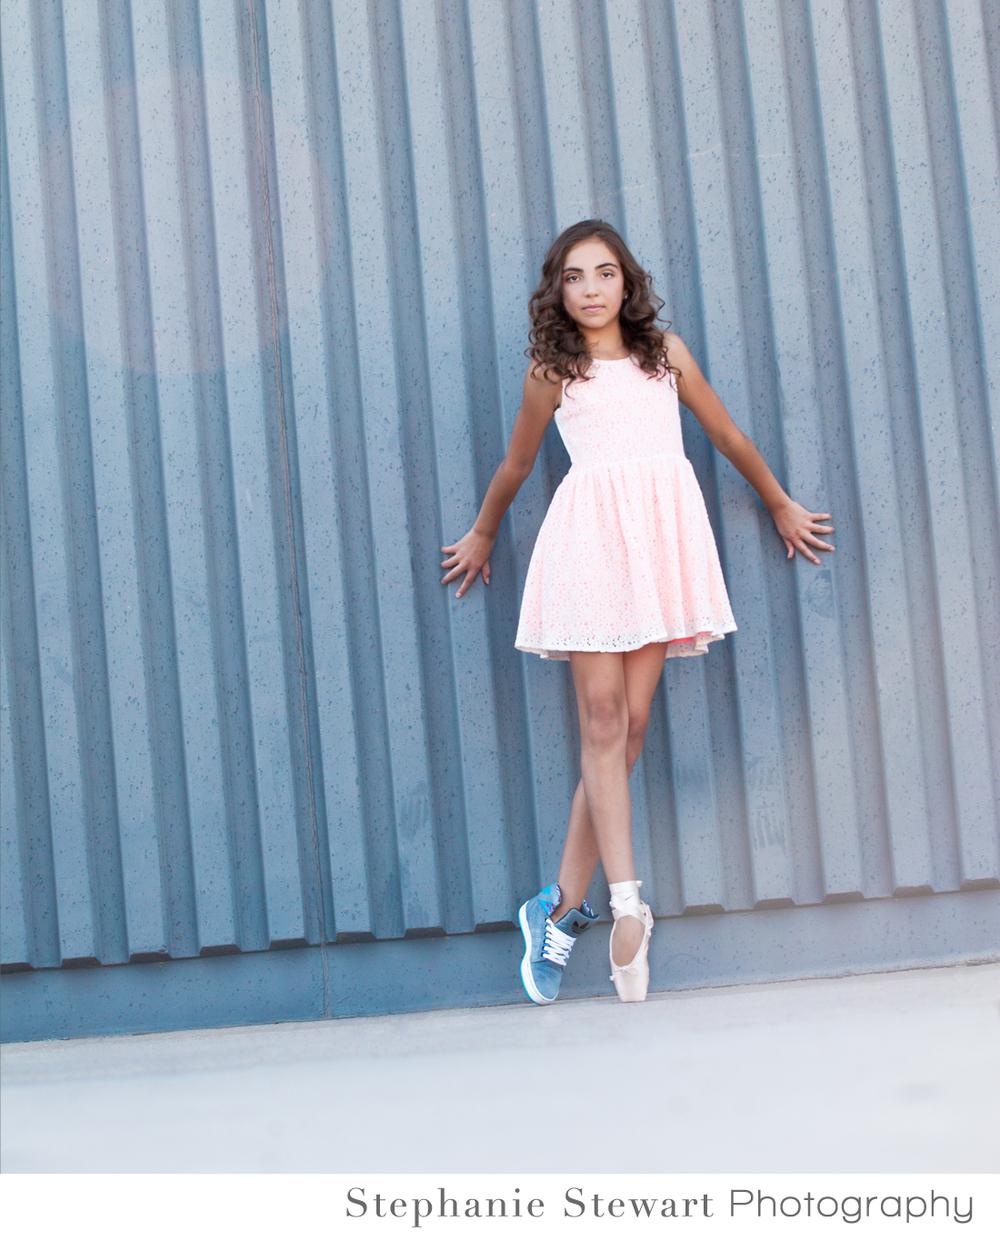 Albuquerque-Santa Fe-Rio Rancho-Beauty-Photographer-Dancer-Teen-Teenager-Ballet-Points-High-Top-Stephanie-Stewart-Photography-009